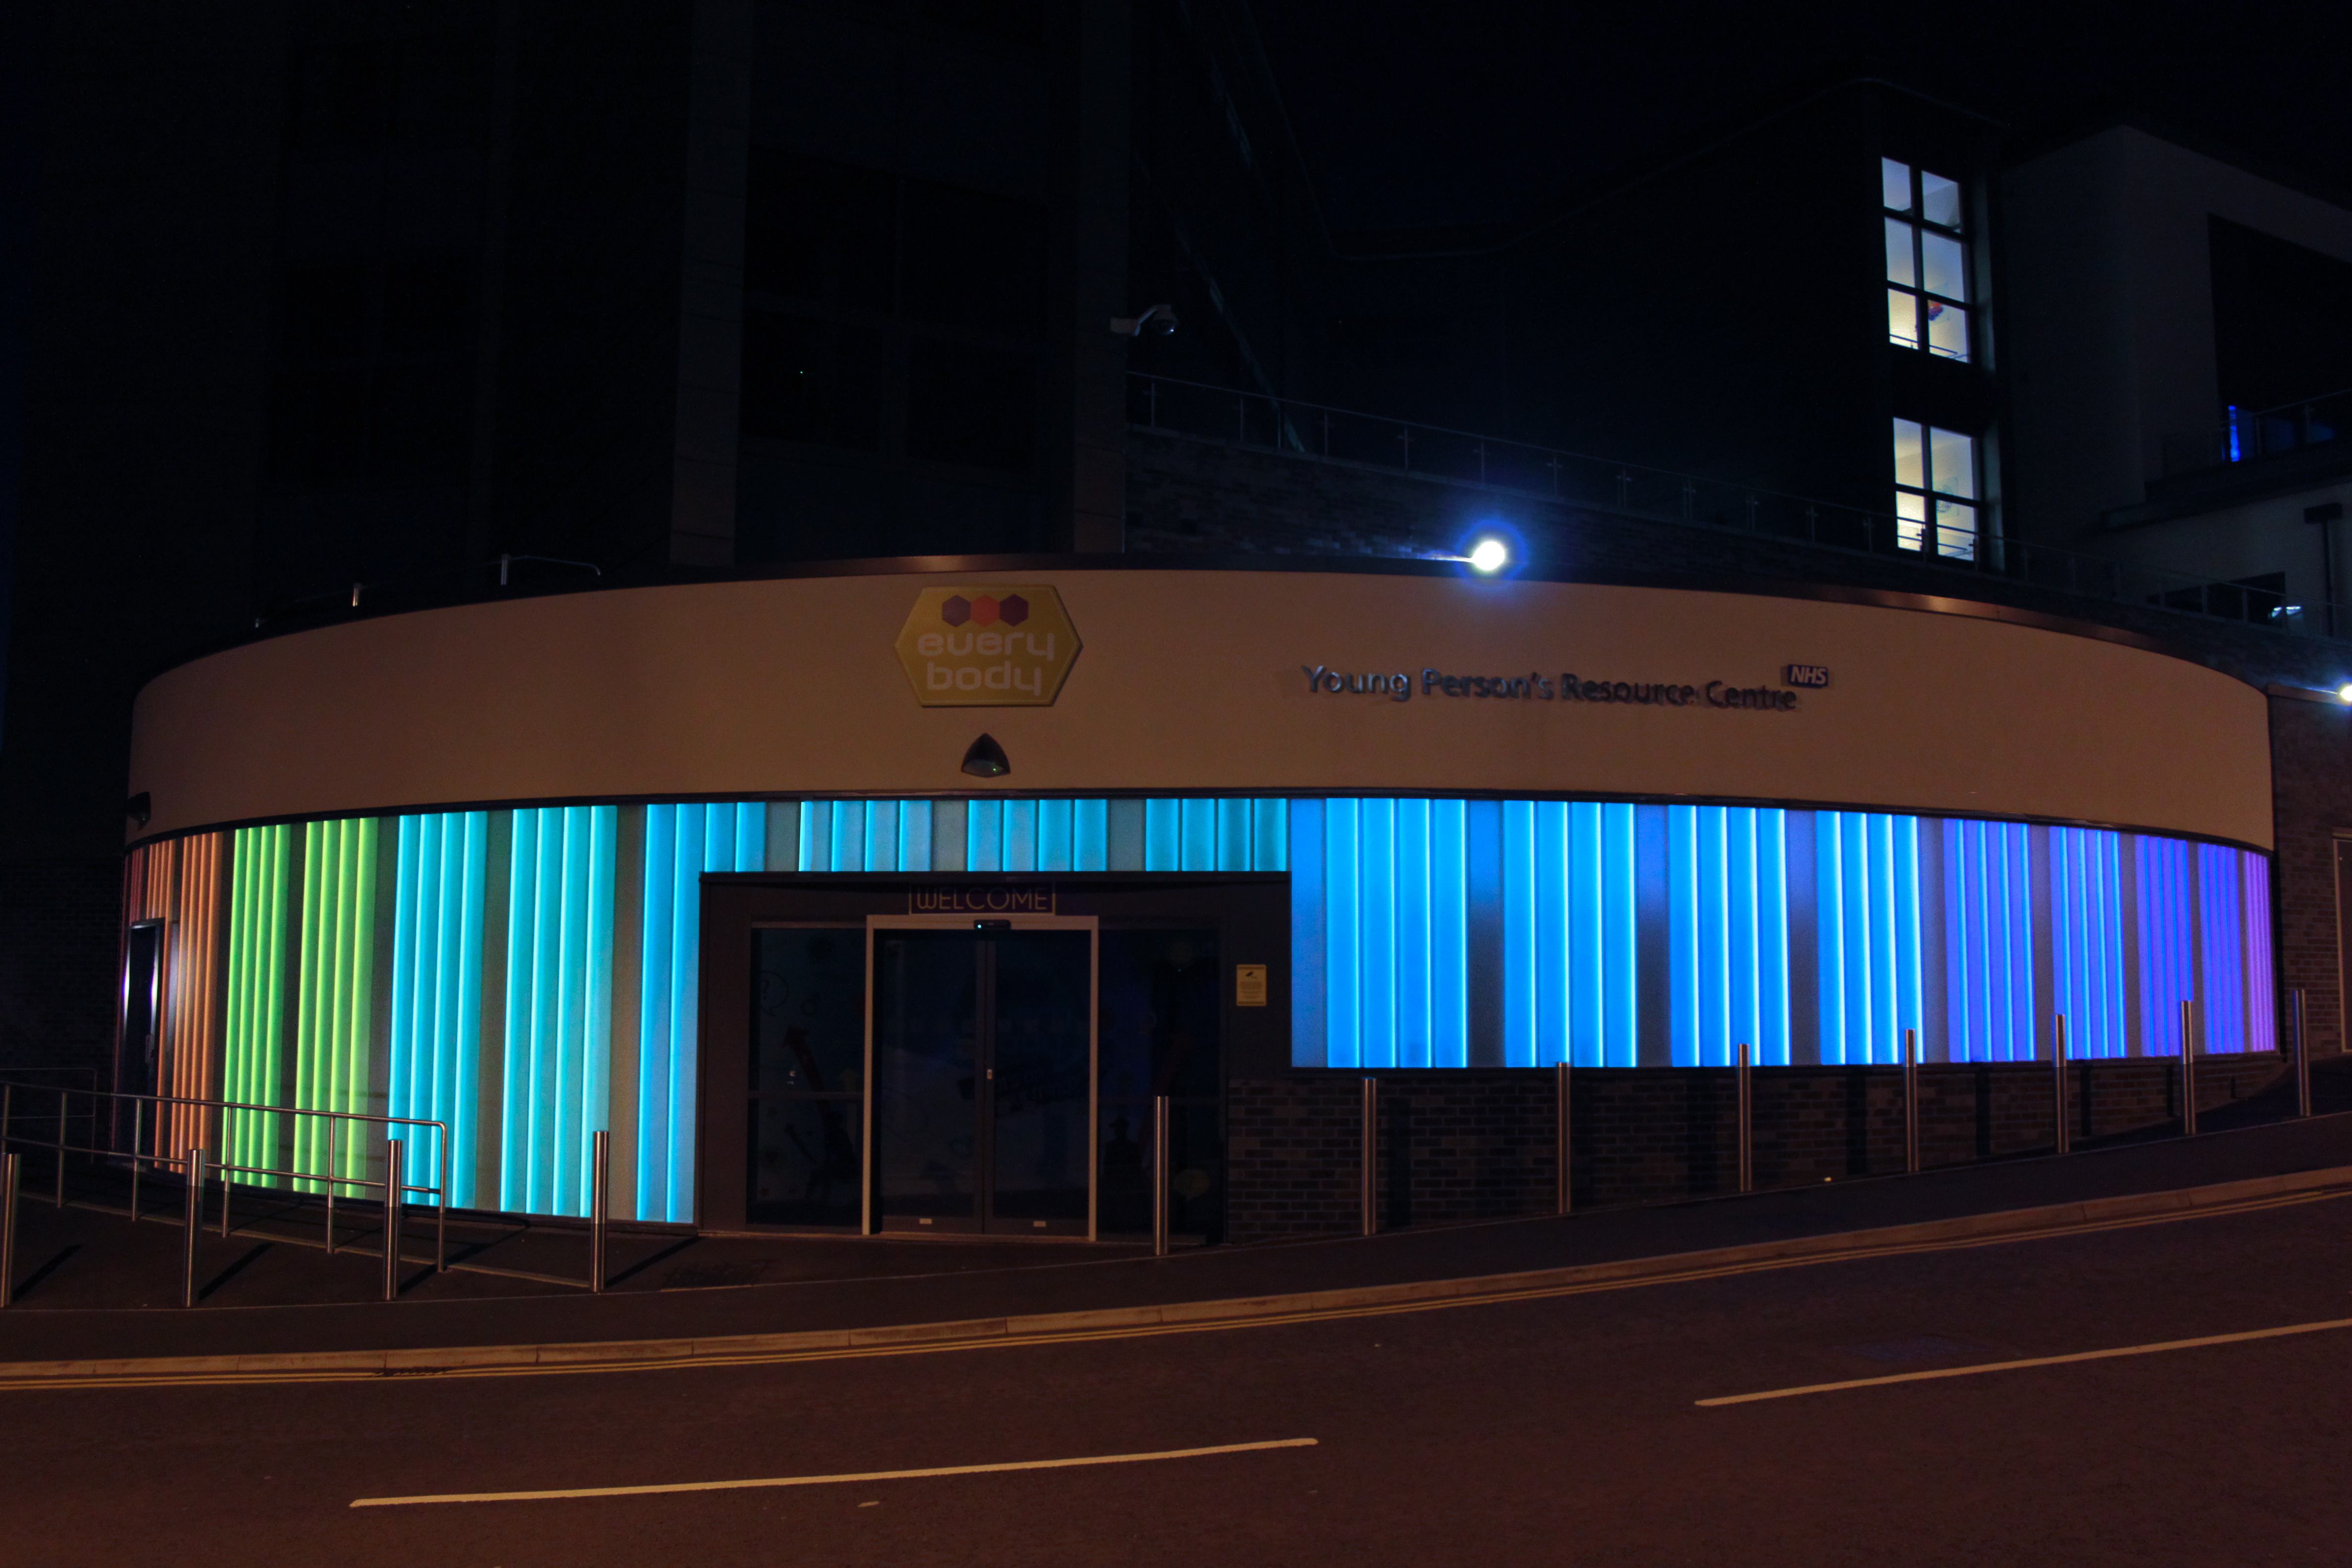 Blackburn Resources Coloured Glass Wall